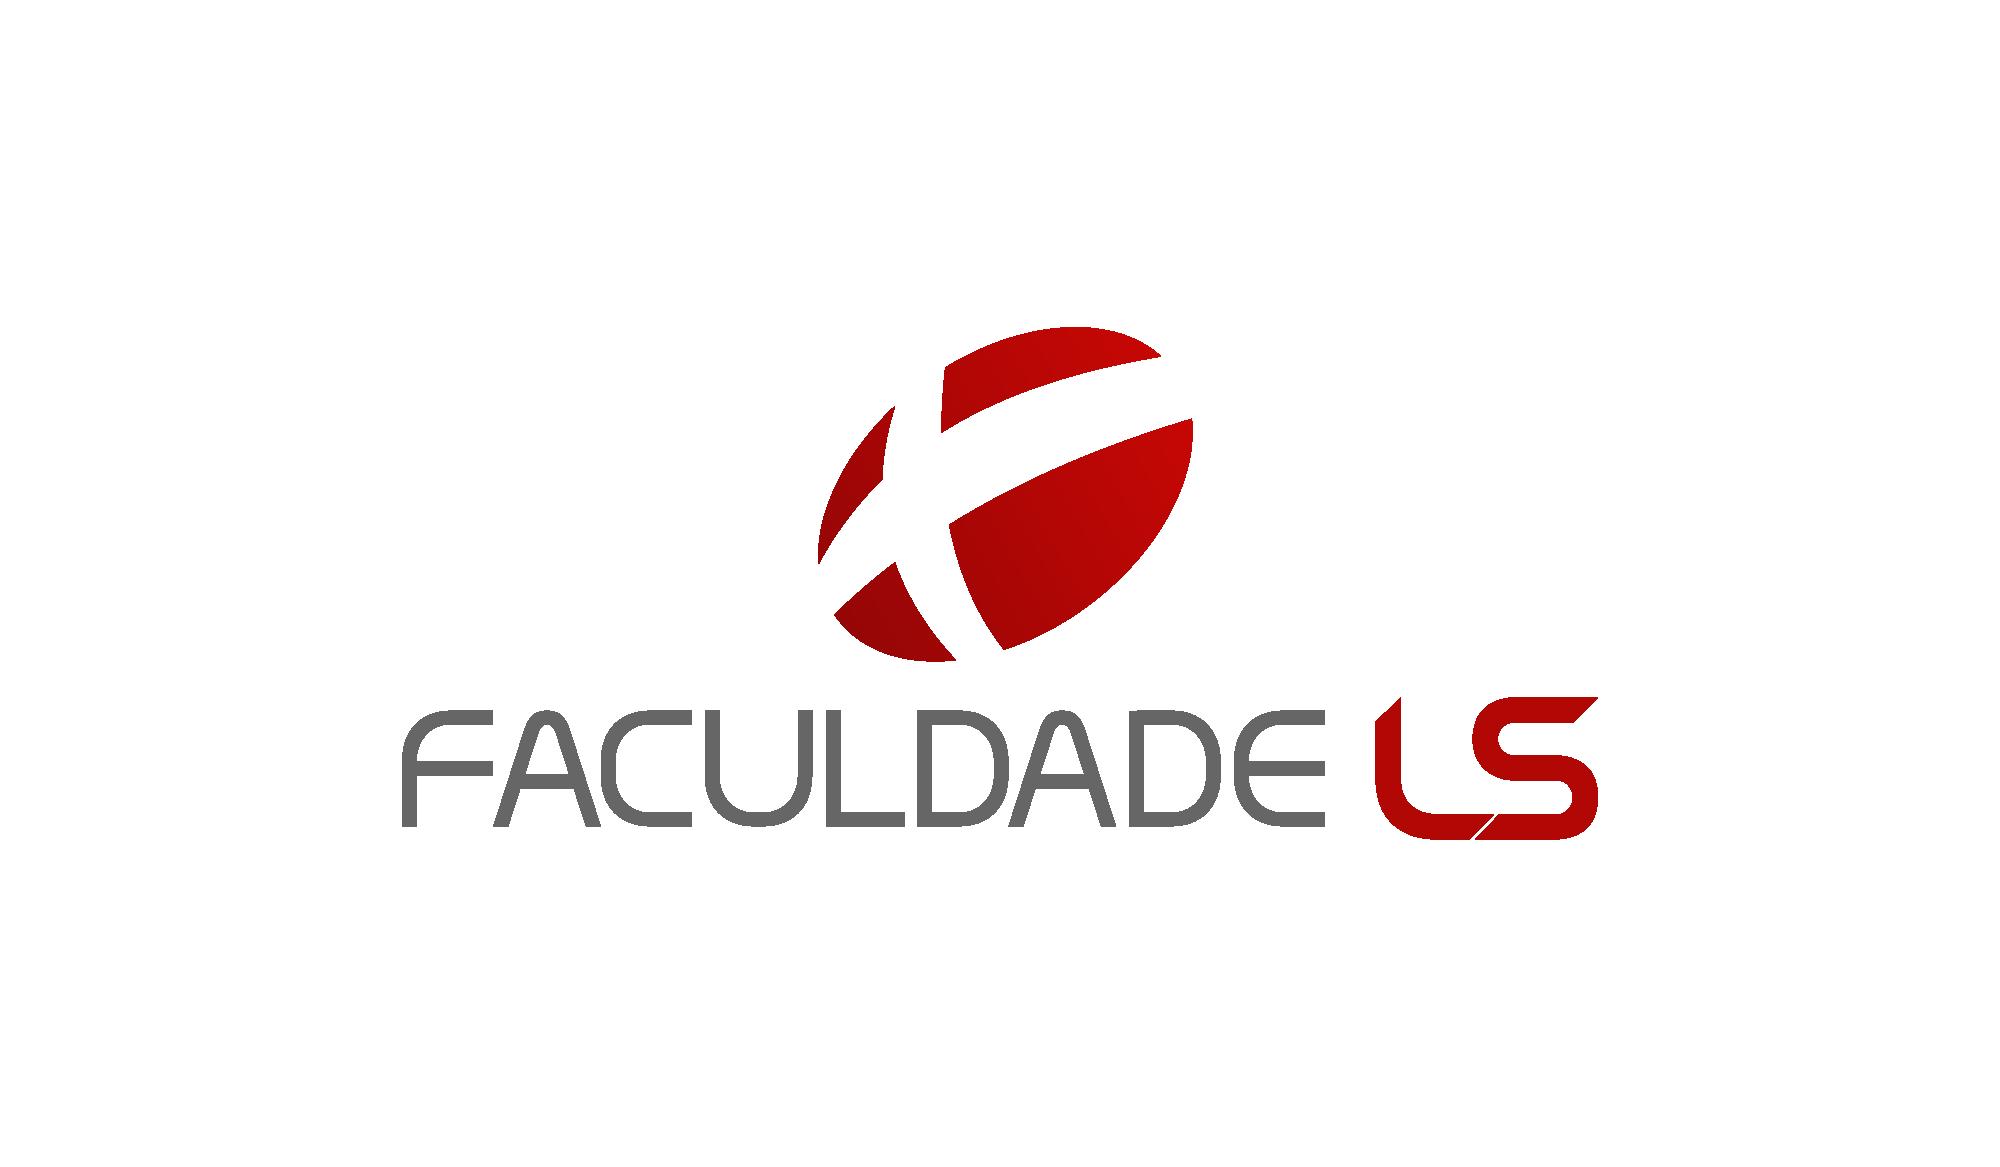 Faculdade LS